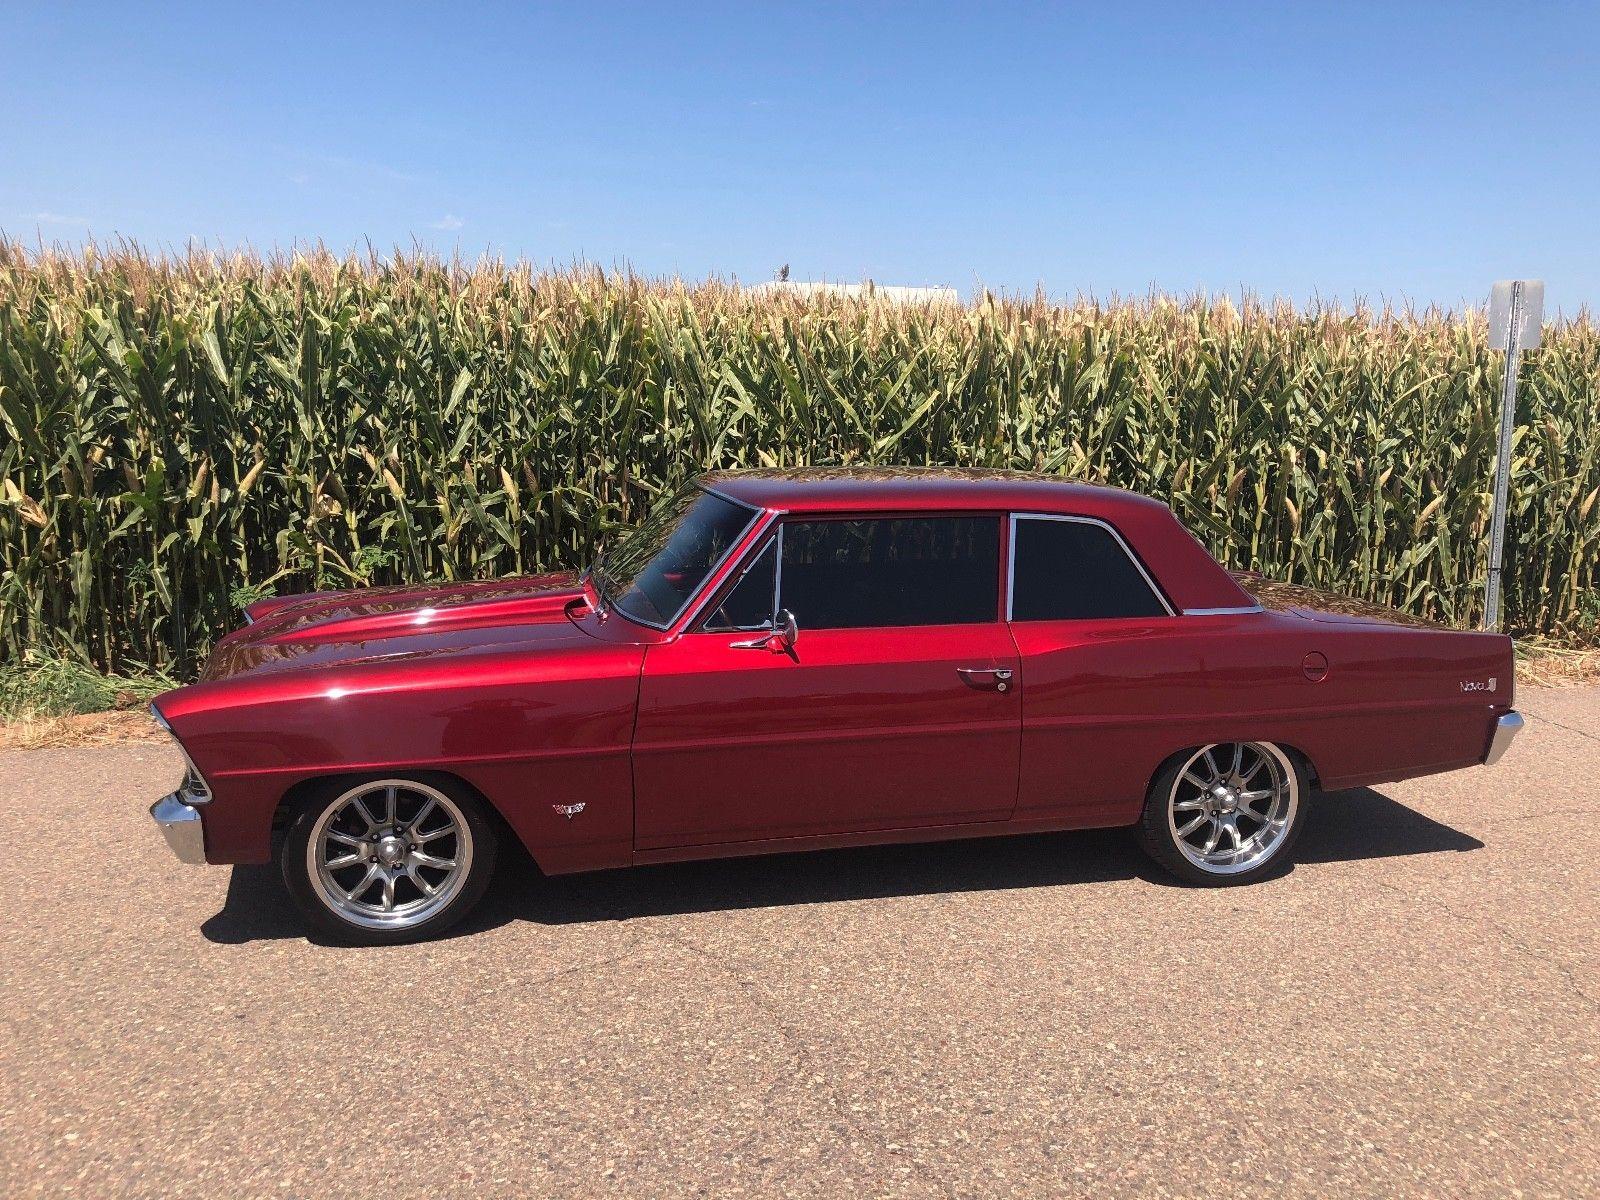 1967 Nova Rear End Swap